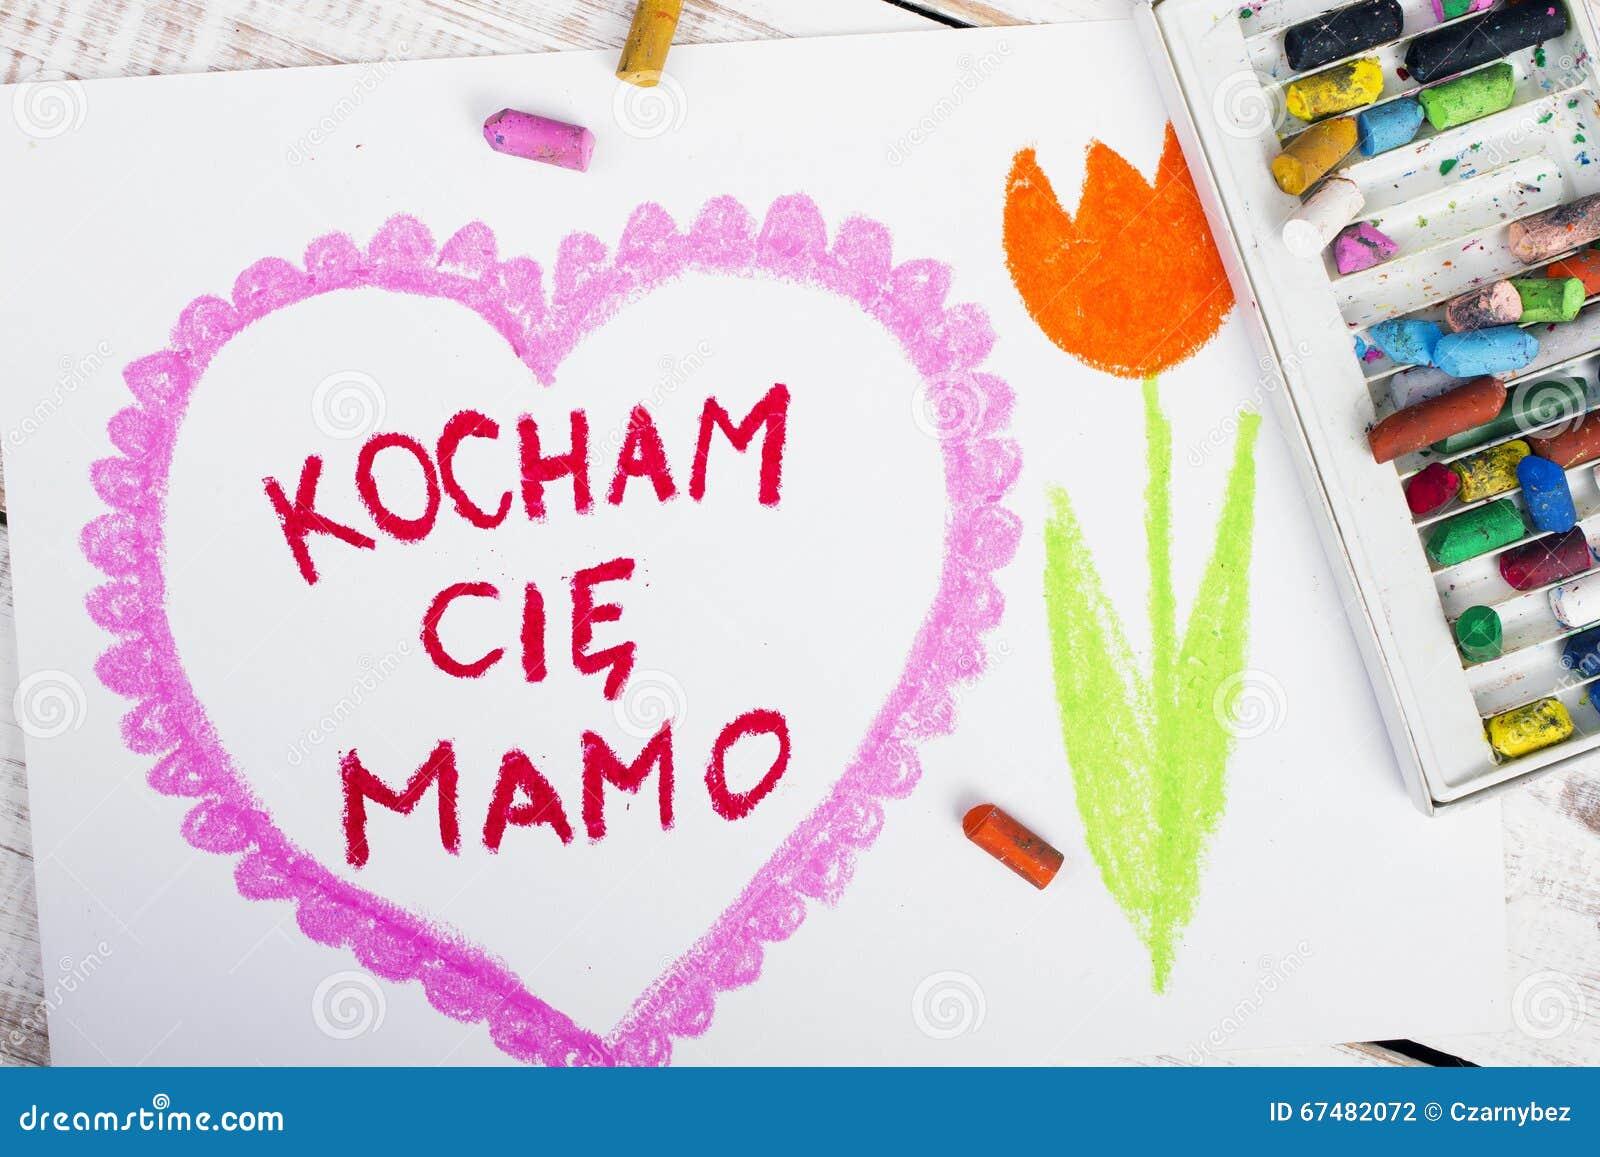 Polish mothers day card stock photo image of greeting 67482072 polish mothers day card kristyandbryce Choice Image